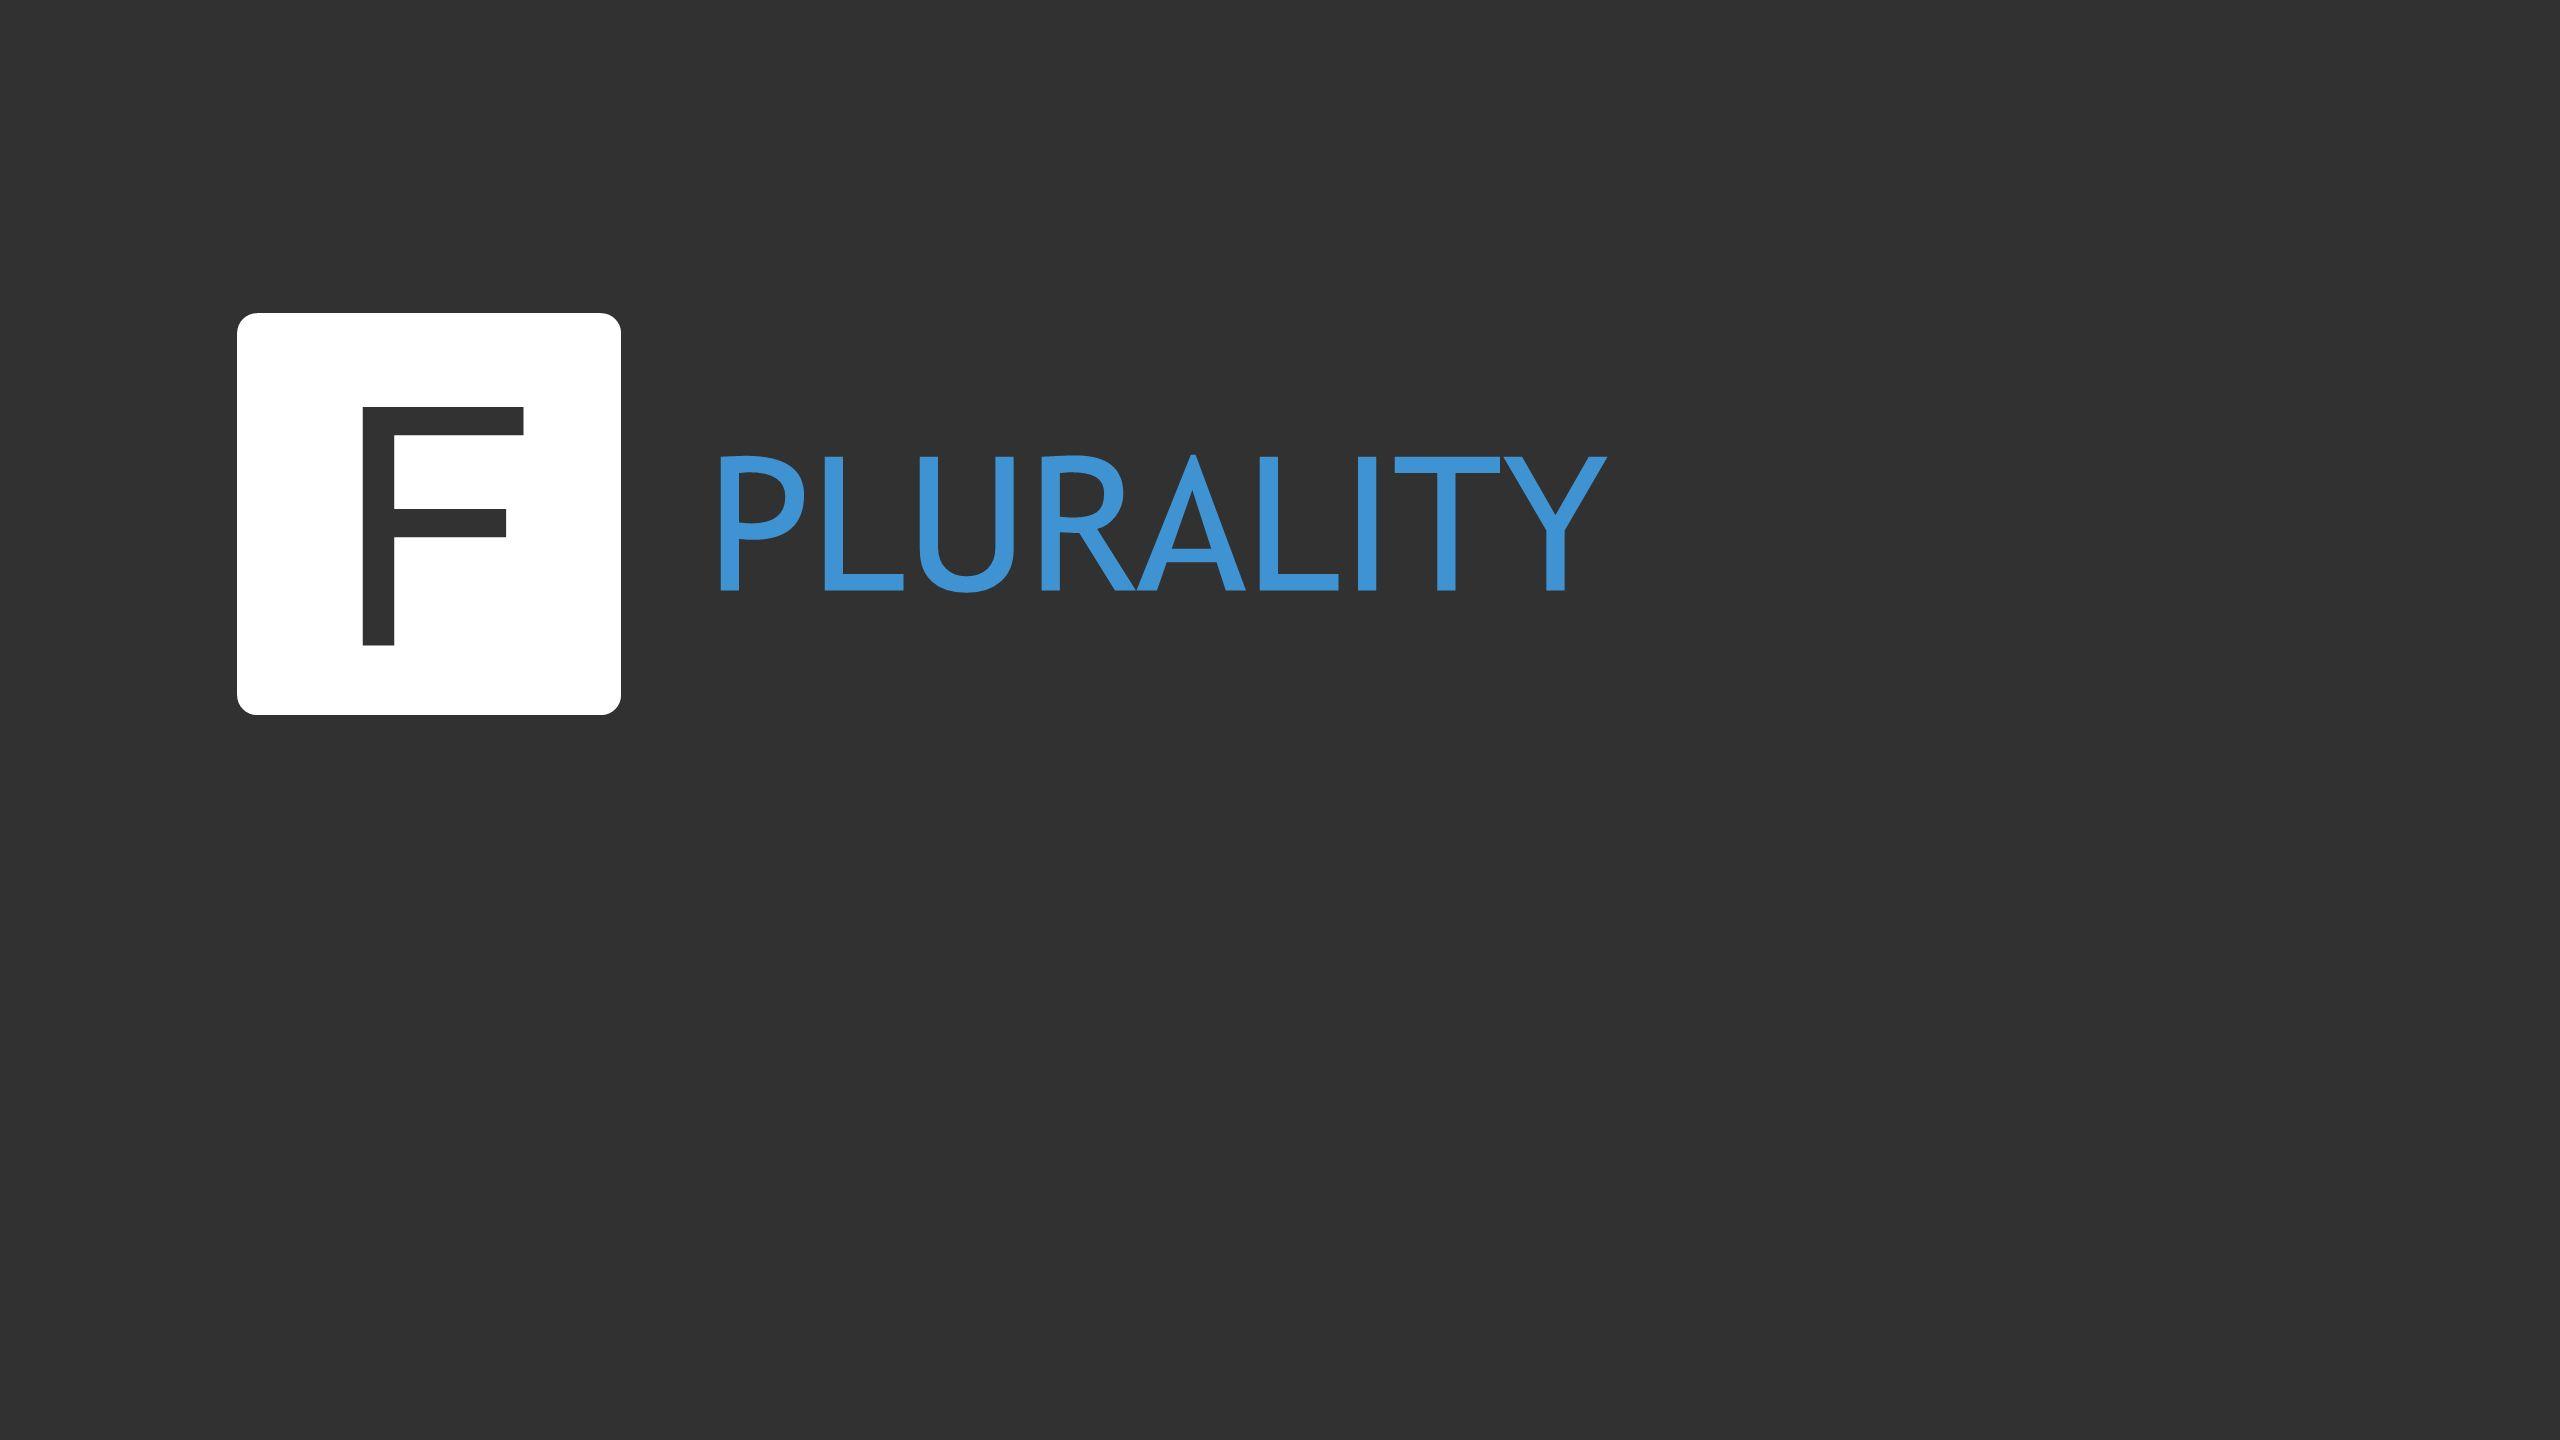 PLURALITY F